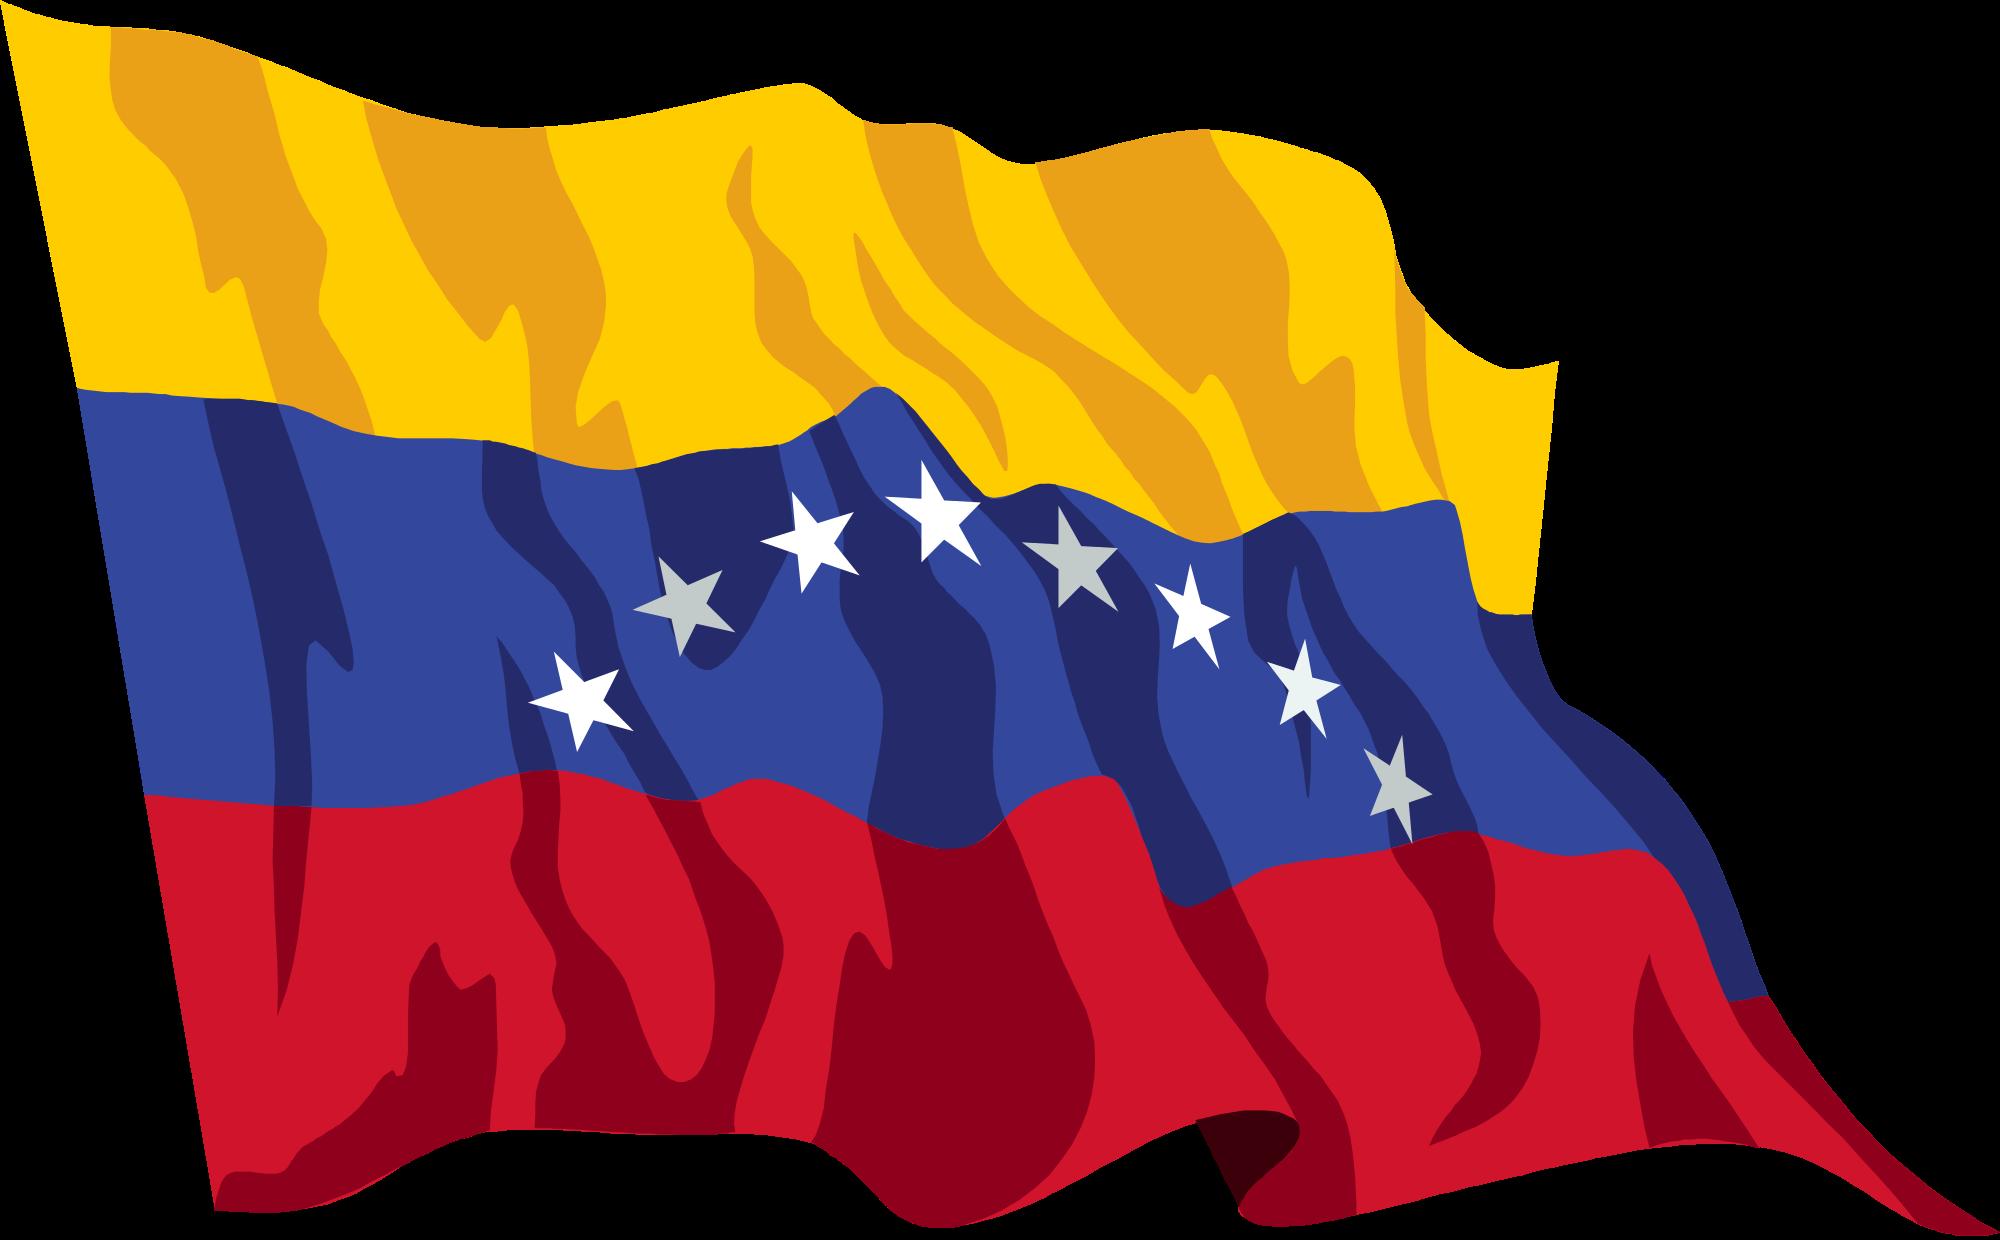 Pin By Jeny Chique On Bandera De Venezuela Flag Eu Flag Country Flags